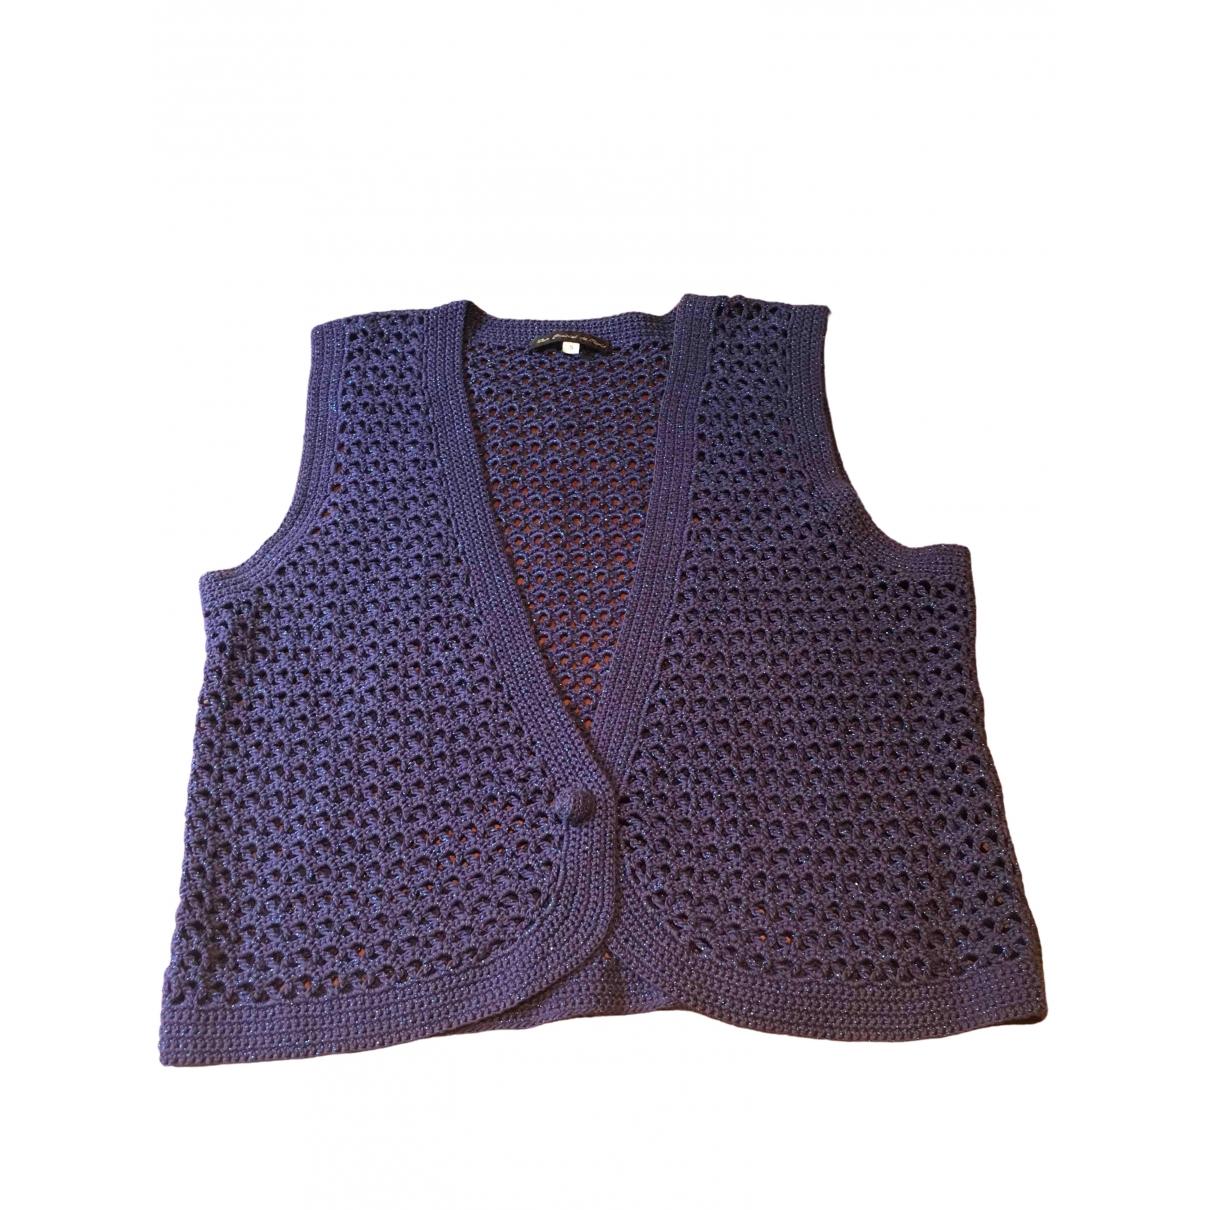 Les Prairies De Paris \N Purple Cotton Knitwear for Women S International